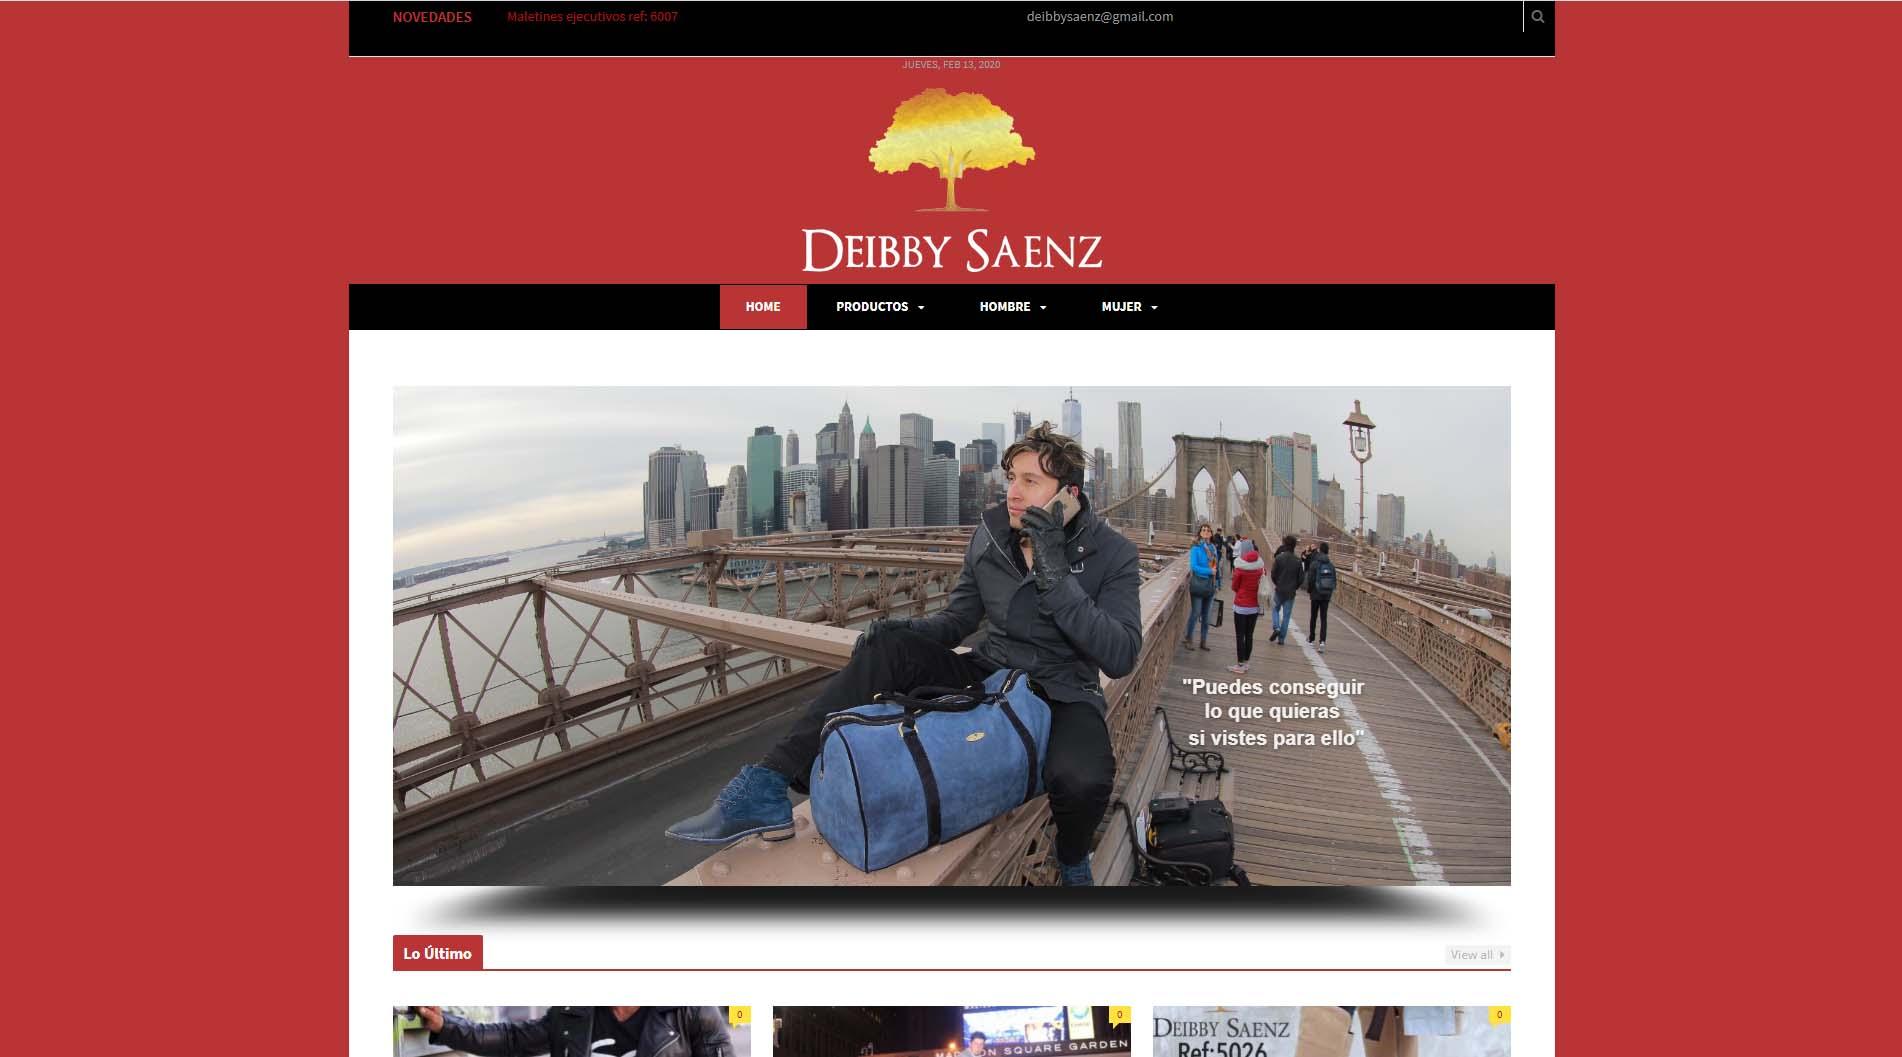 Diseño web deibby saenz